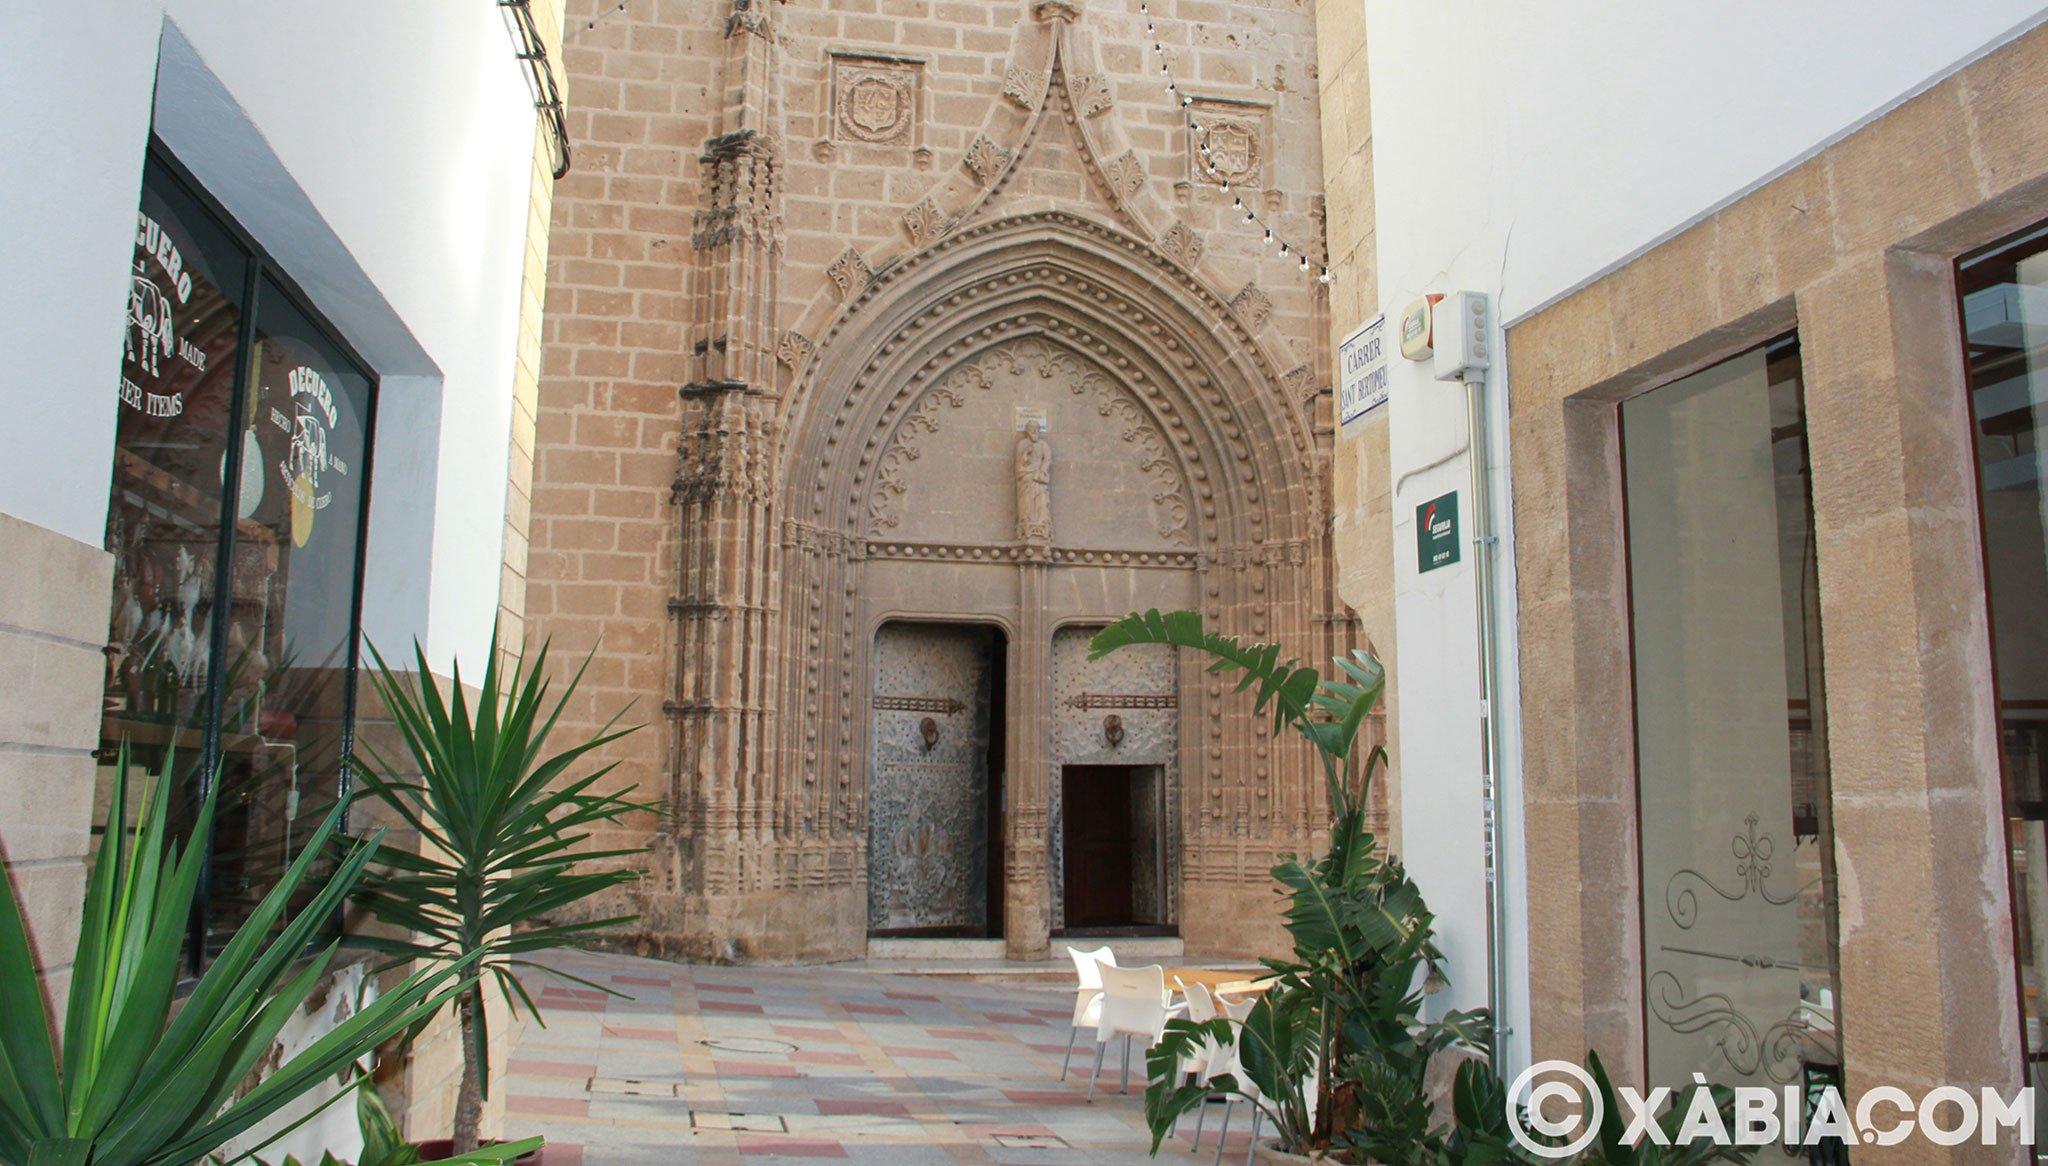 Calles con encanto alrededor de la Iglesia Fortaleza de San Bartolomé de Jávea